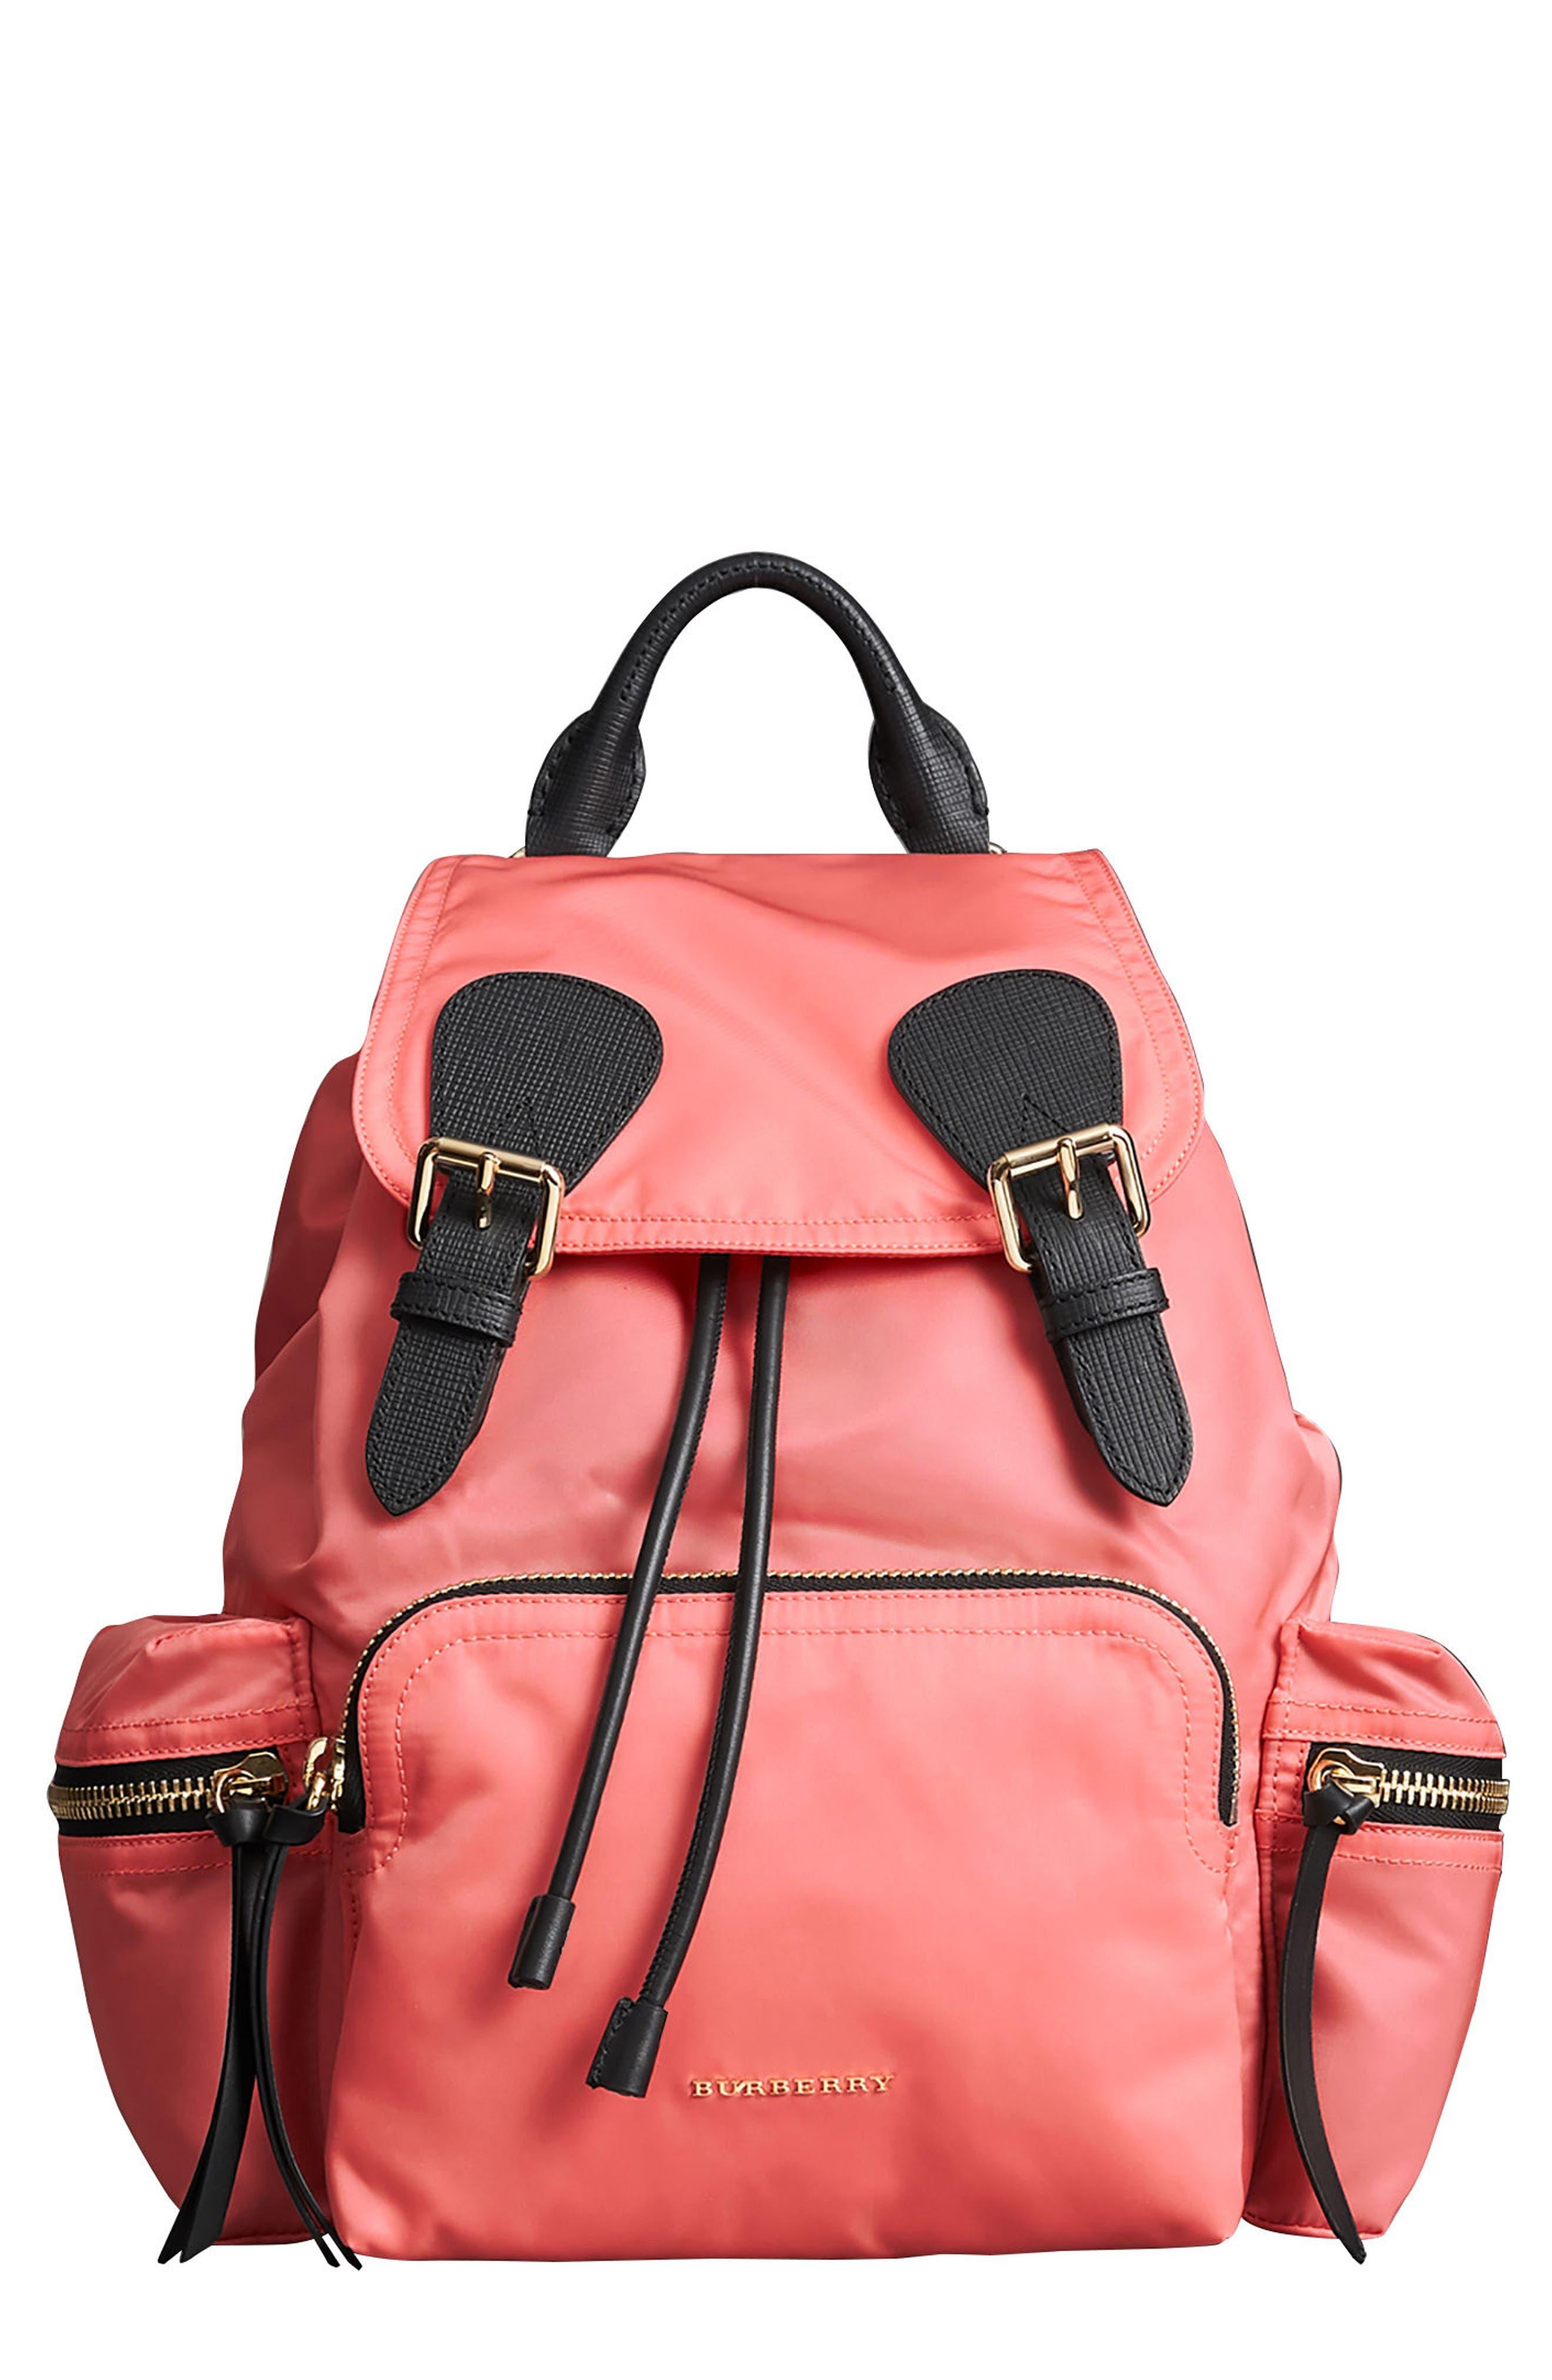 Medium Rucksack Nylon Backpack,                             Main thumbnail 1, color,                             950